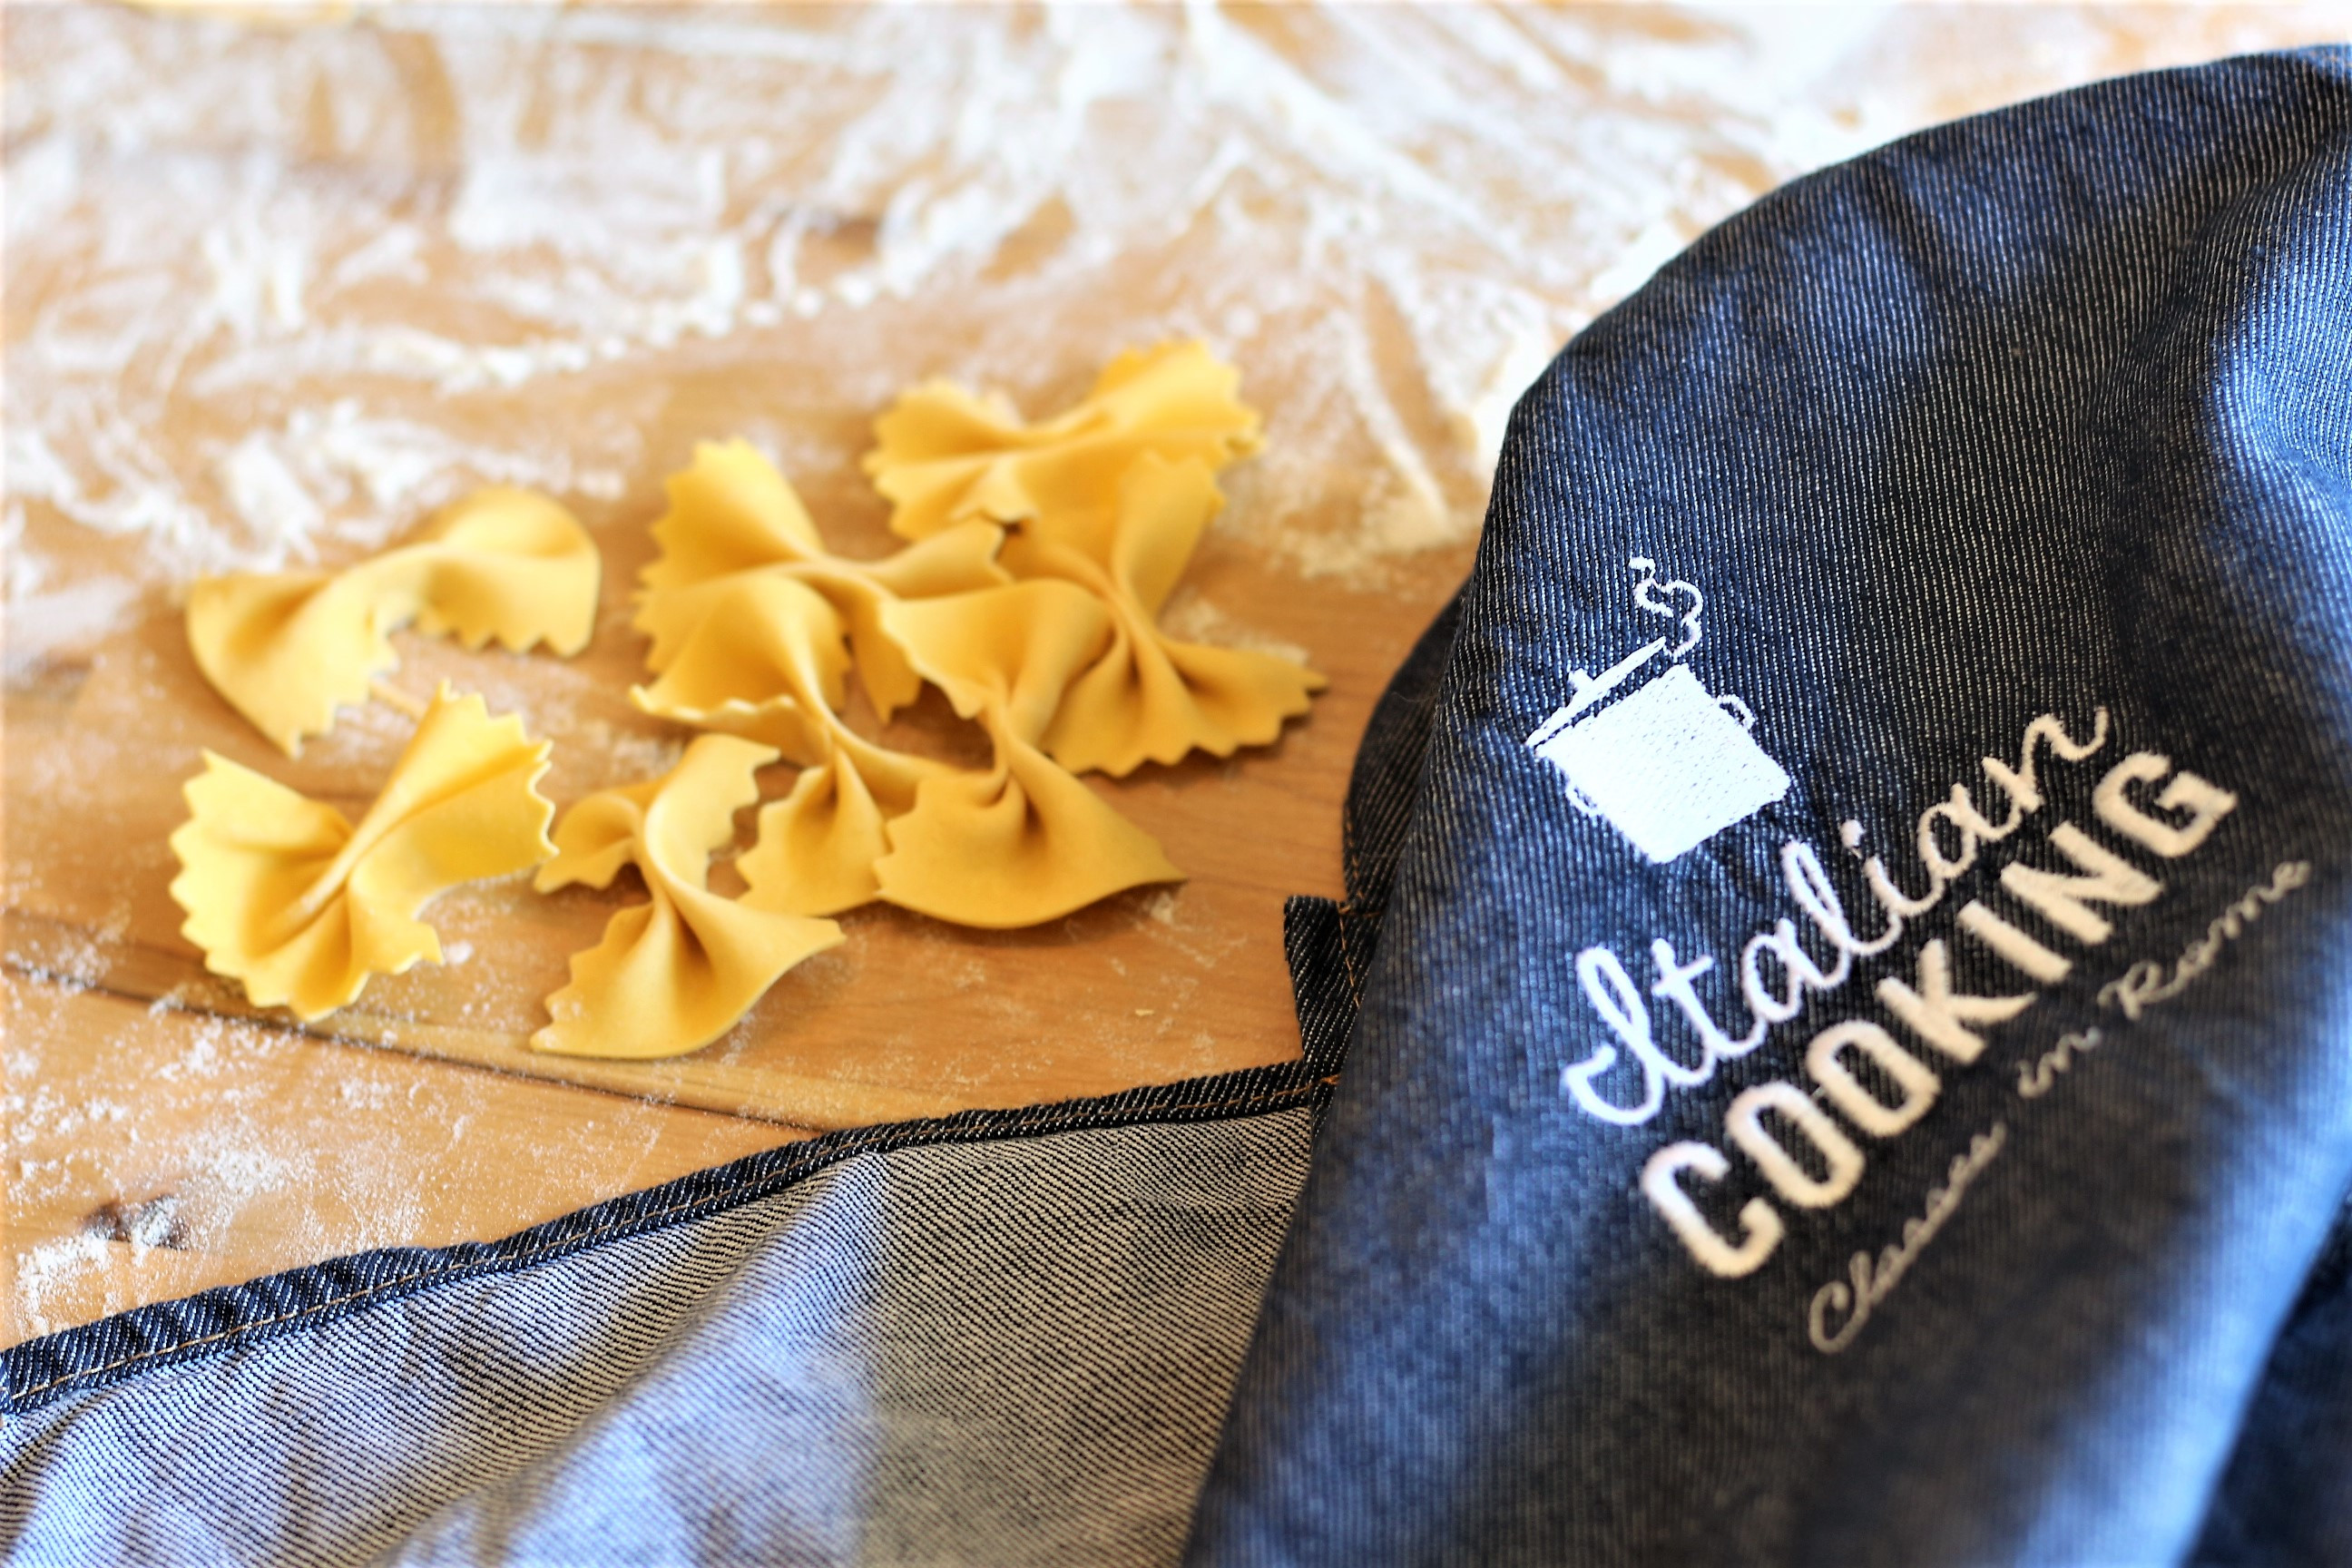 Pasta making class Rome & Tiramisù